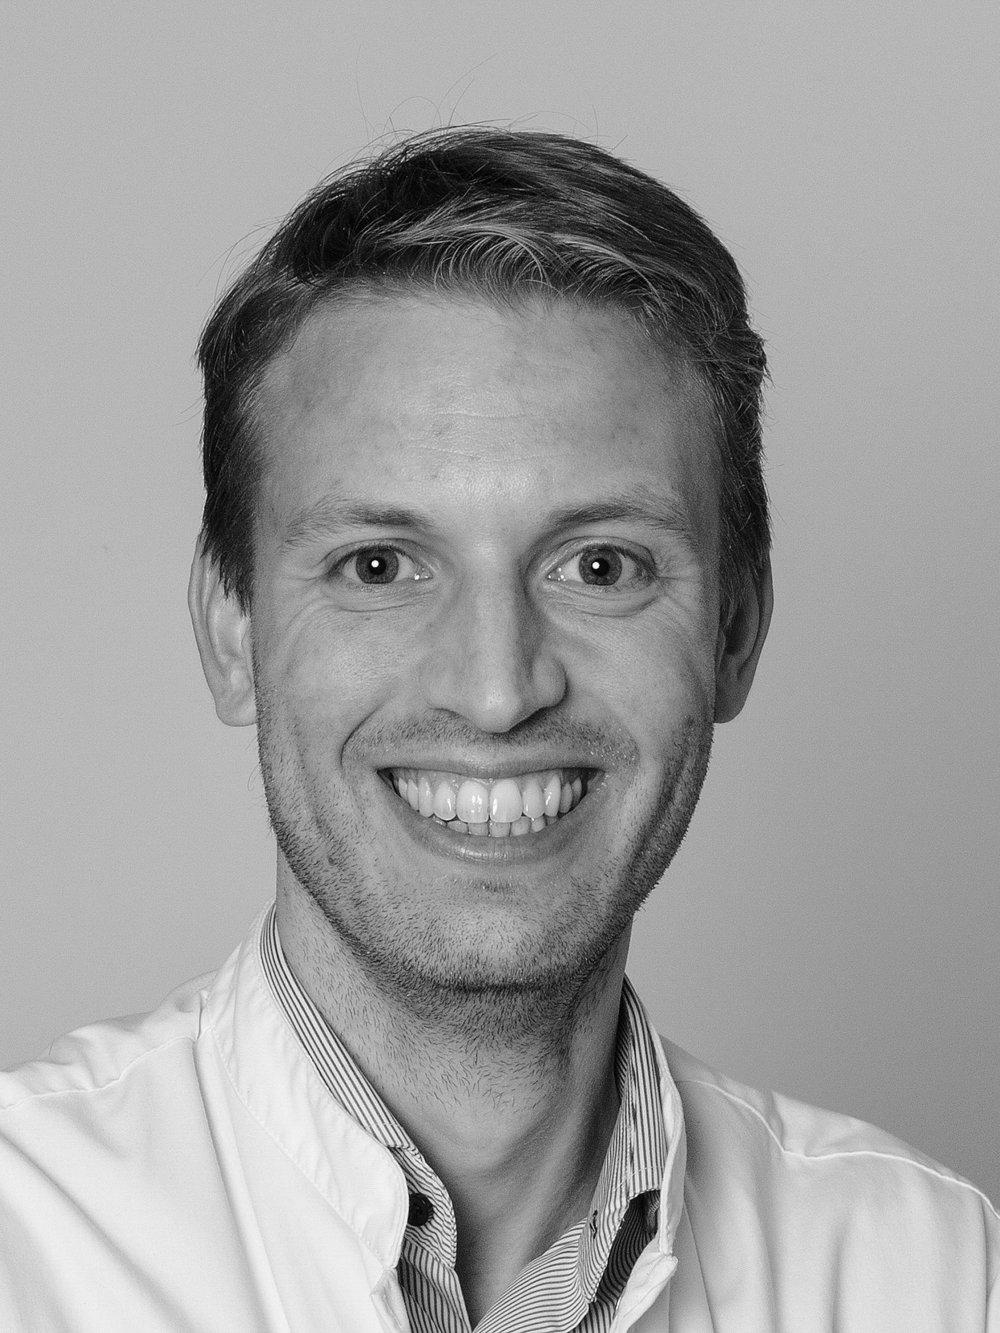 Vincent Odekerken